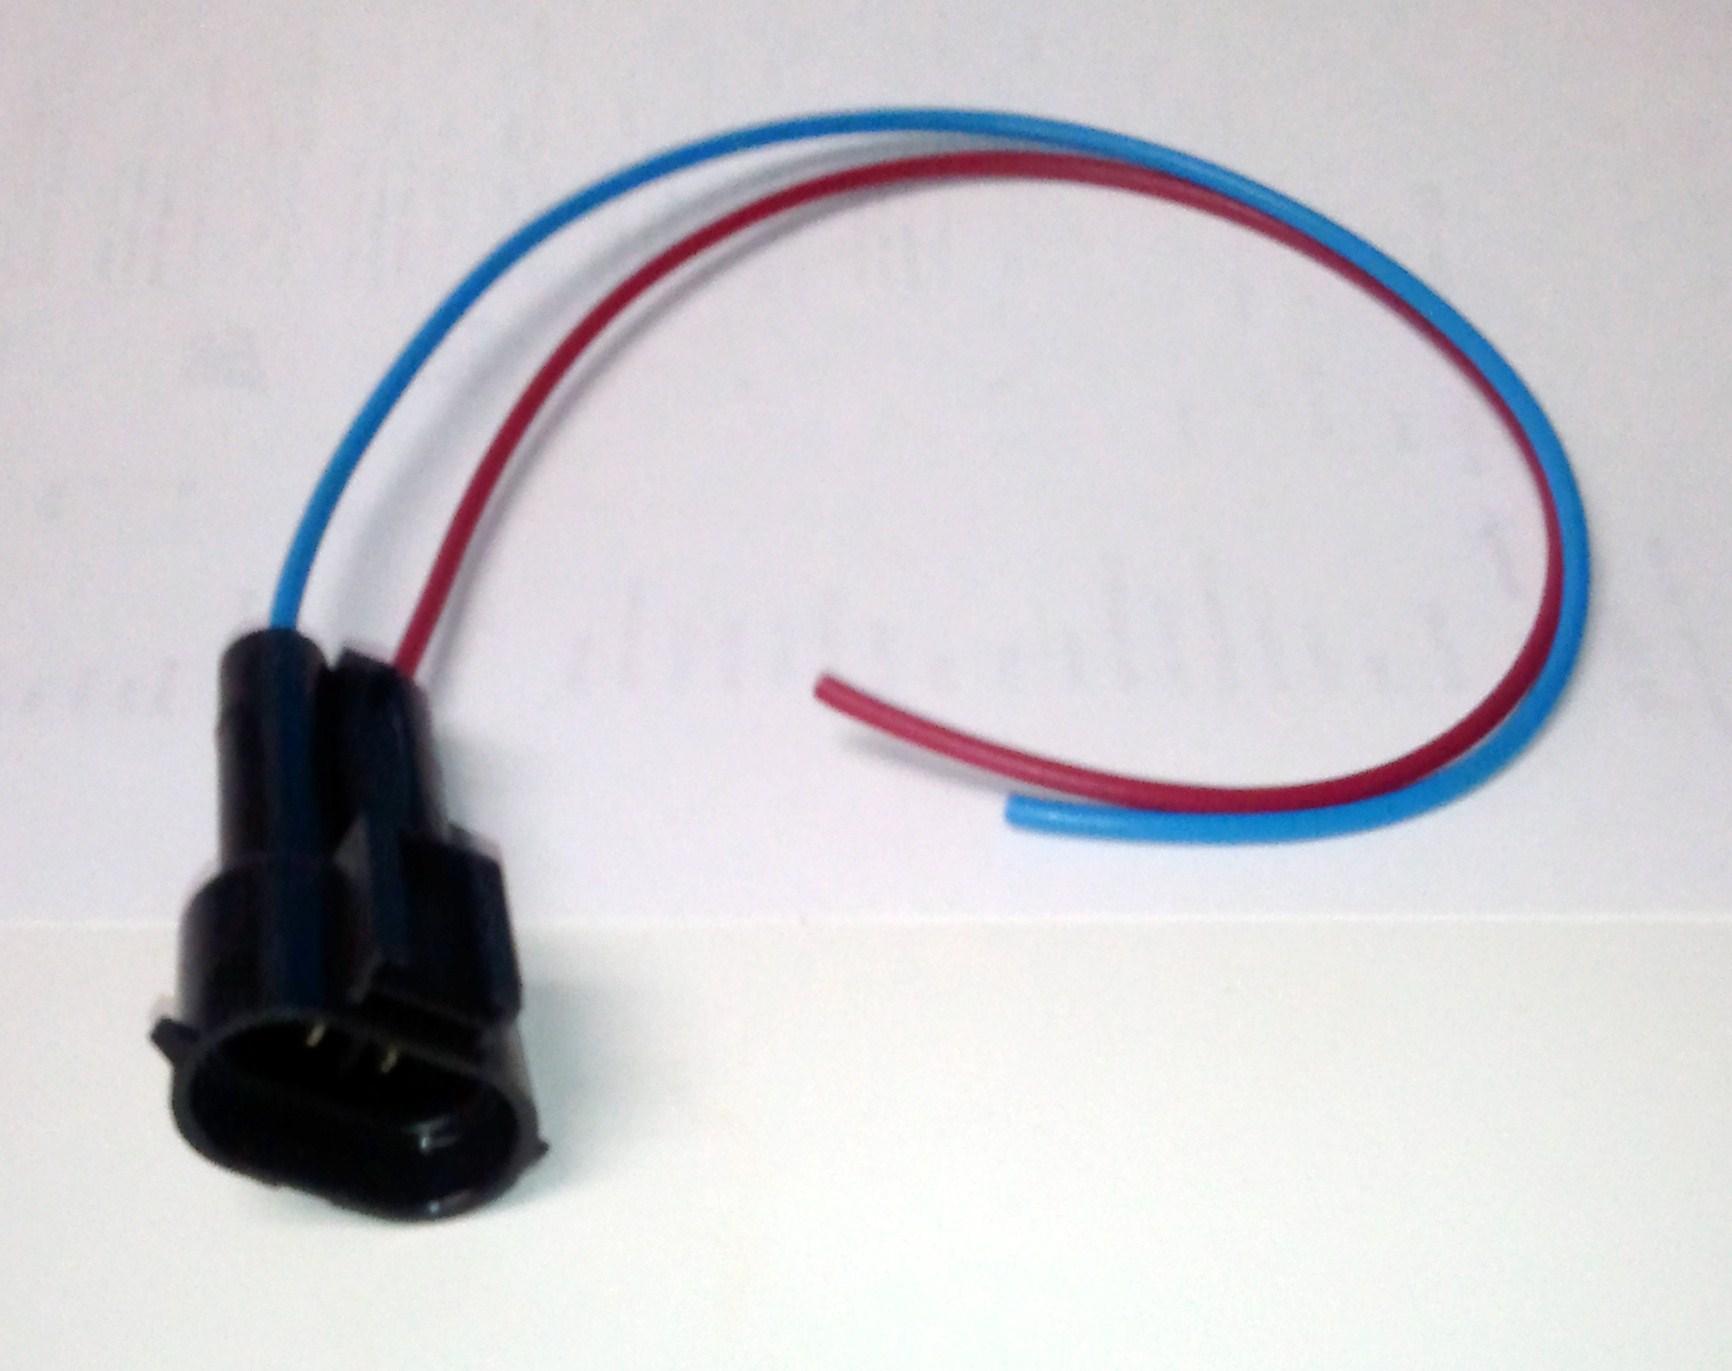 hight resolution of h11 halogen headlight wiring harness h13 headlight wiring 2013 nissan altima headlight wiring harness headlight wiring